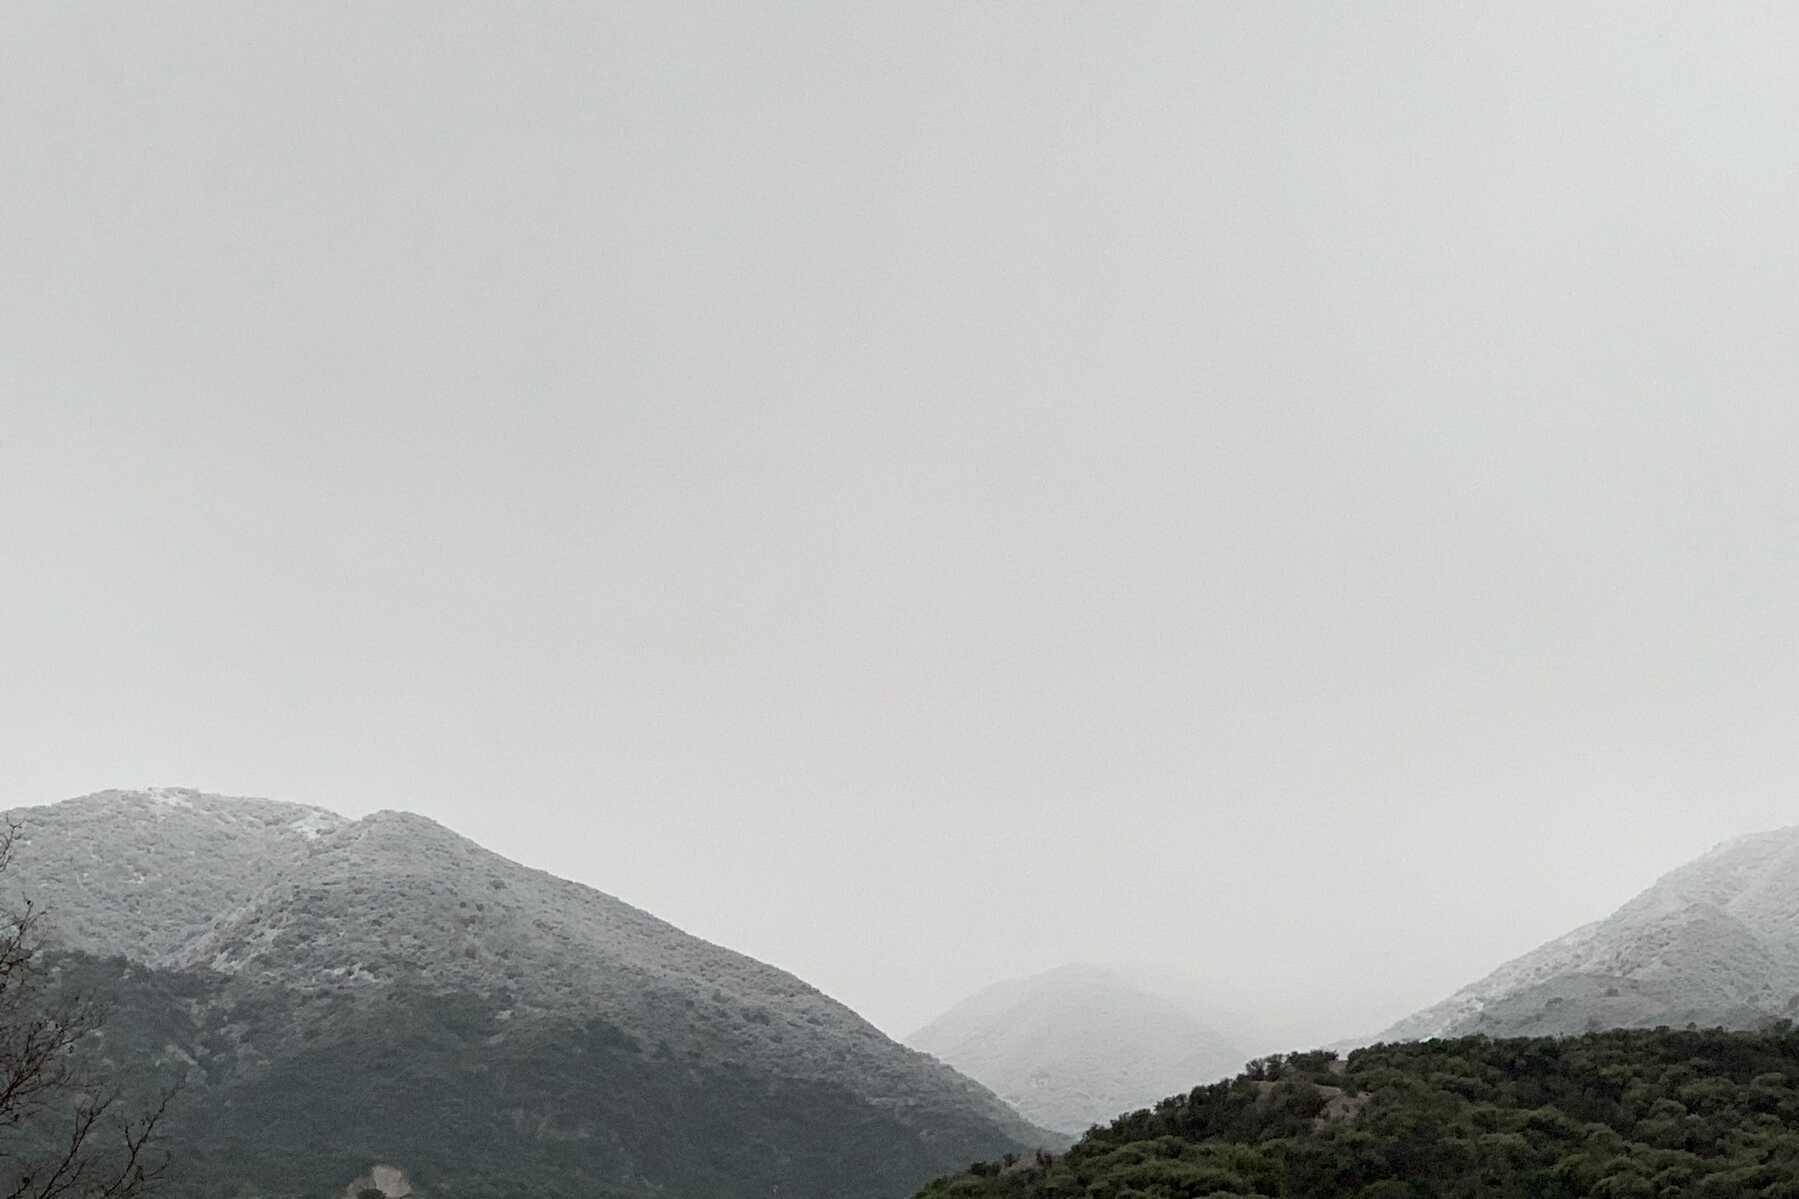 Snowy hills in Corona.